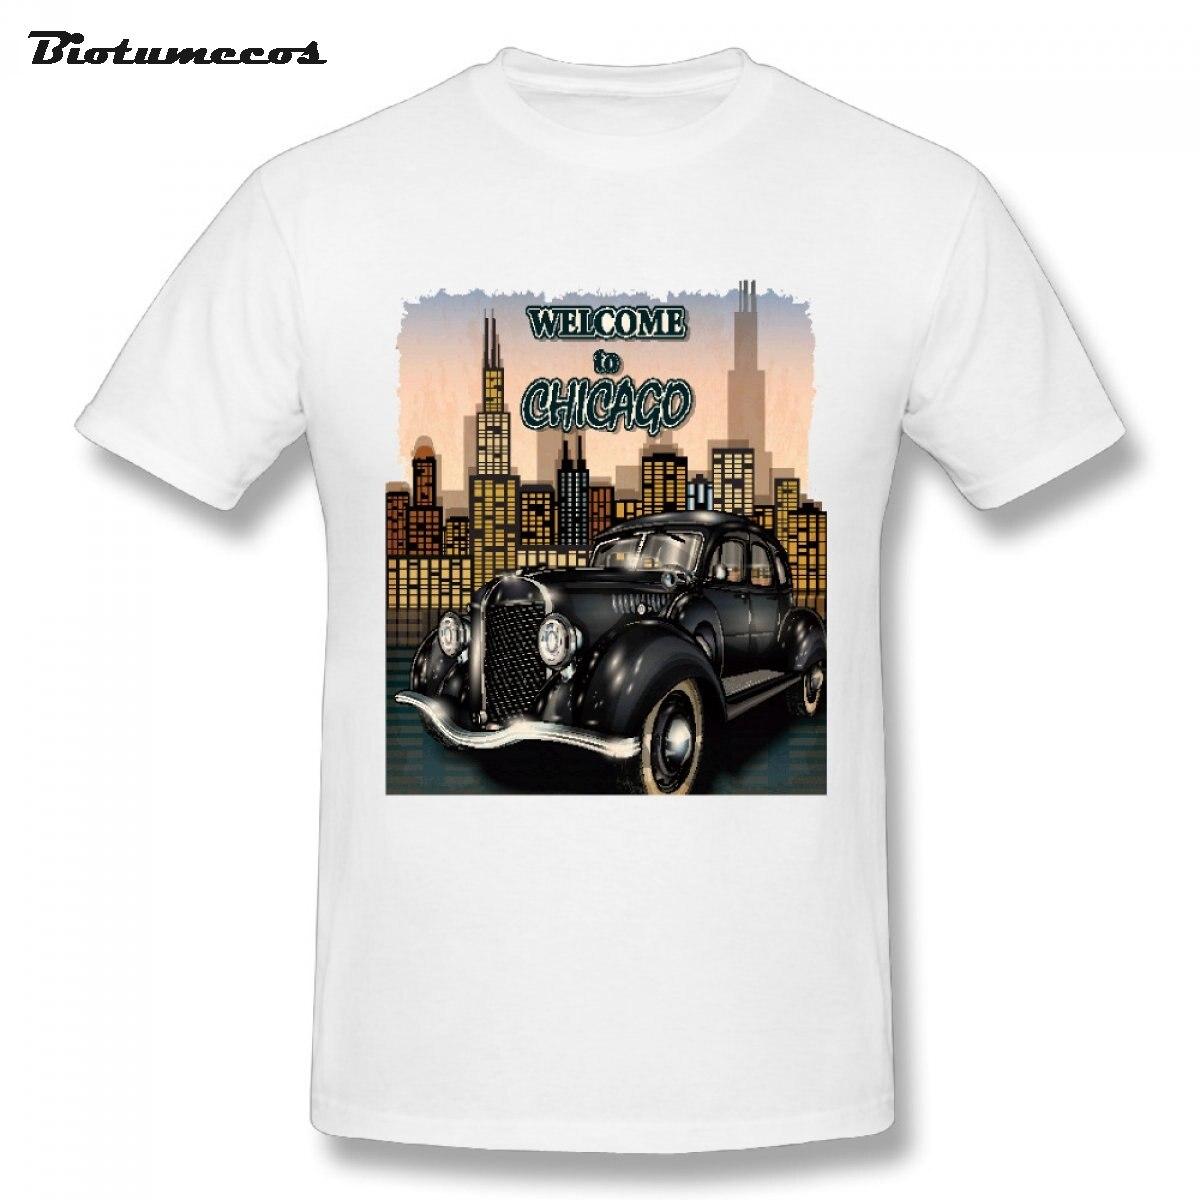 Gt86 design t shirts men s t shirt - 2017 Newest Men Tshirt Welcome To Chicago Black Retro Car Bubble Car Tall Building Printed Short